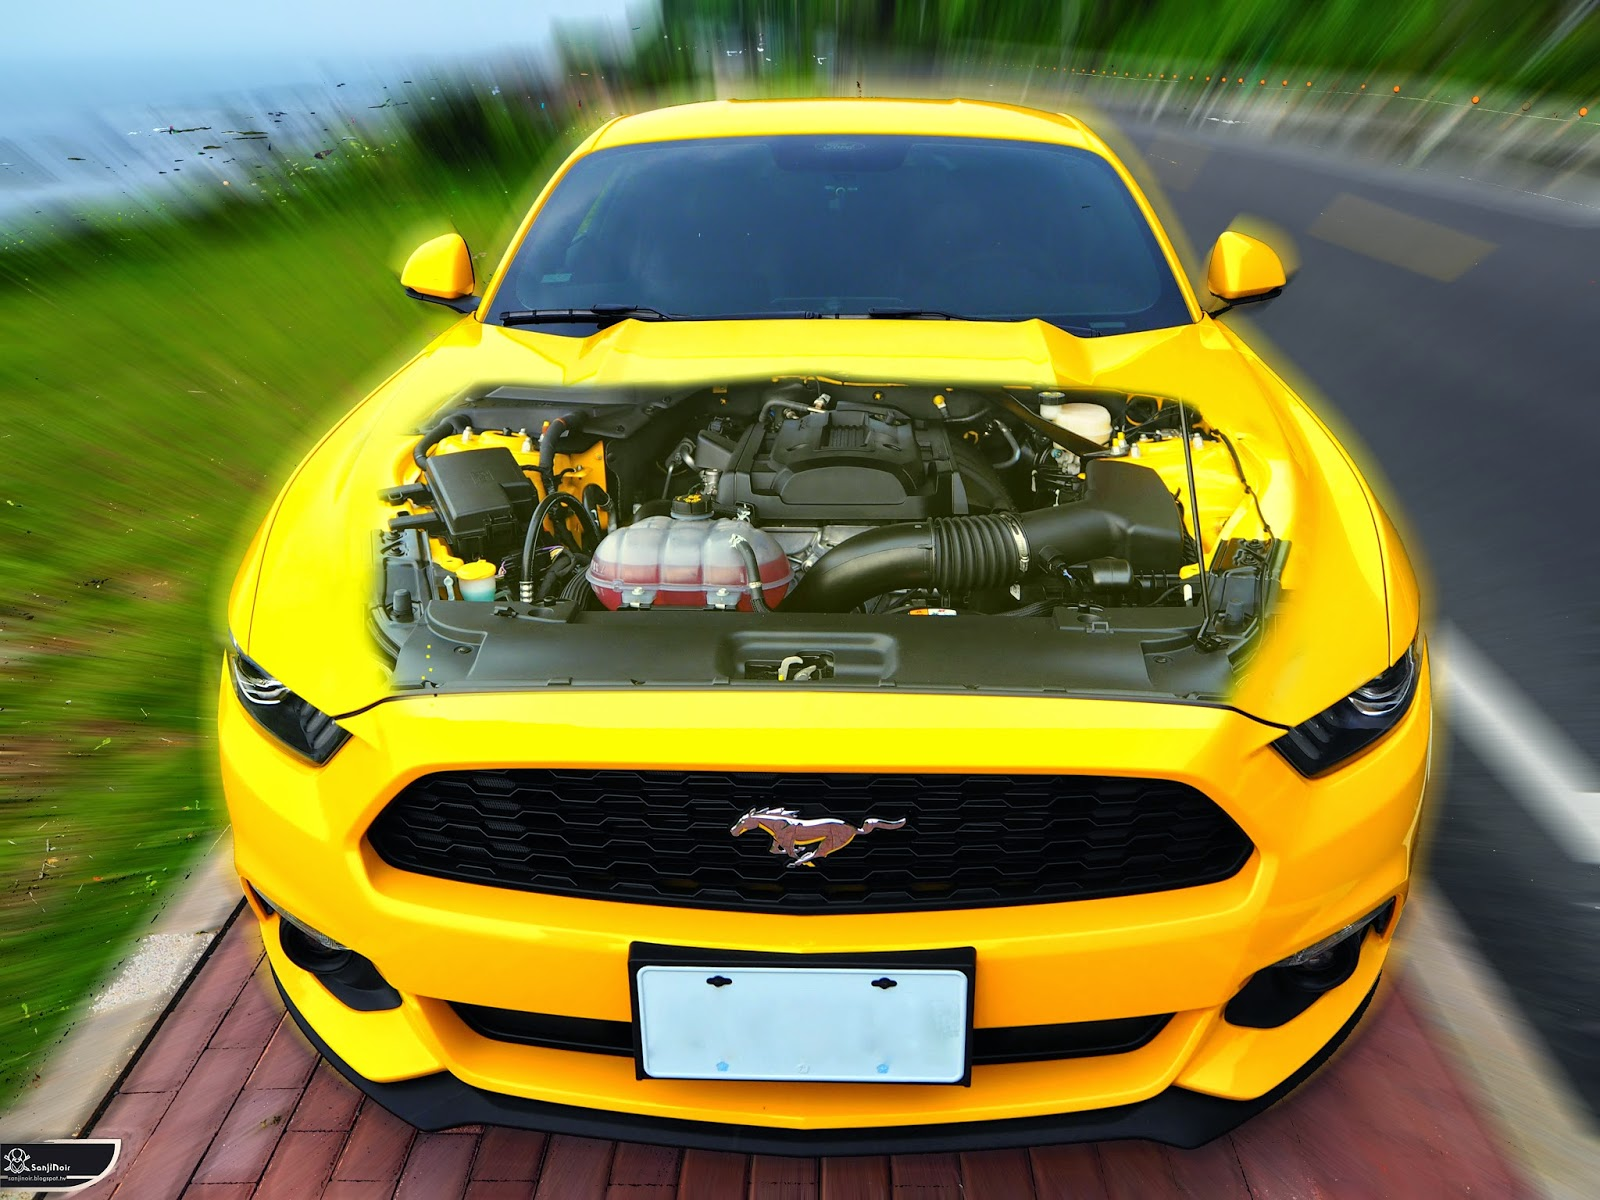 開箱試駕 真外掛無雙!2015福特野馬跑車Ford Mustang 2.3 EcoBoost